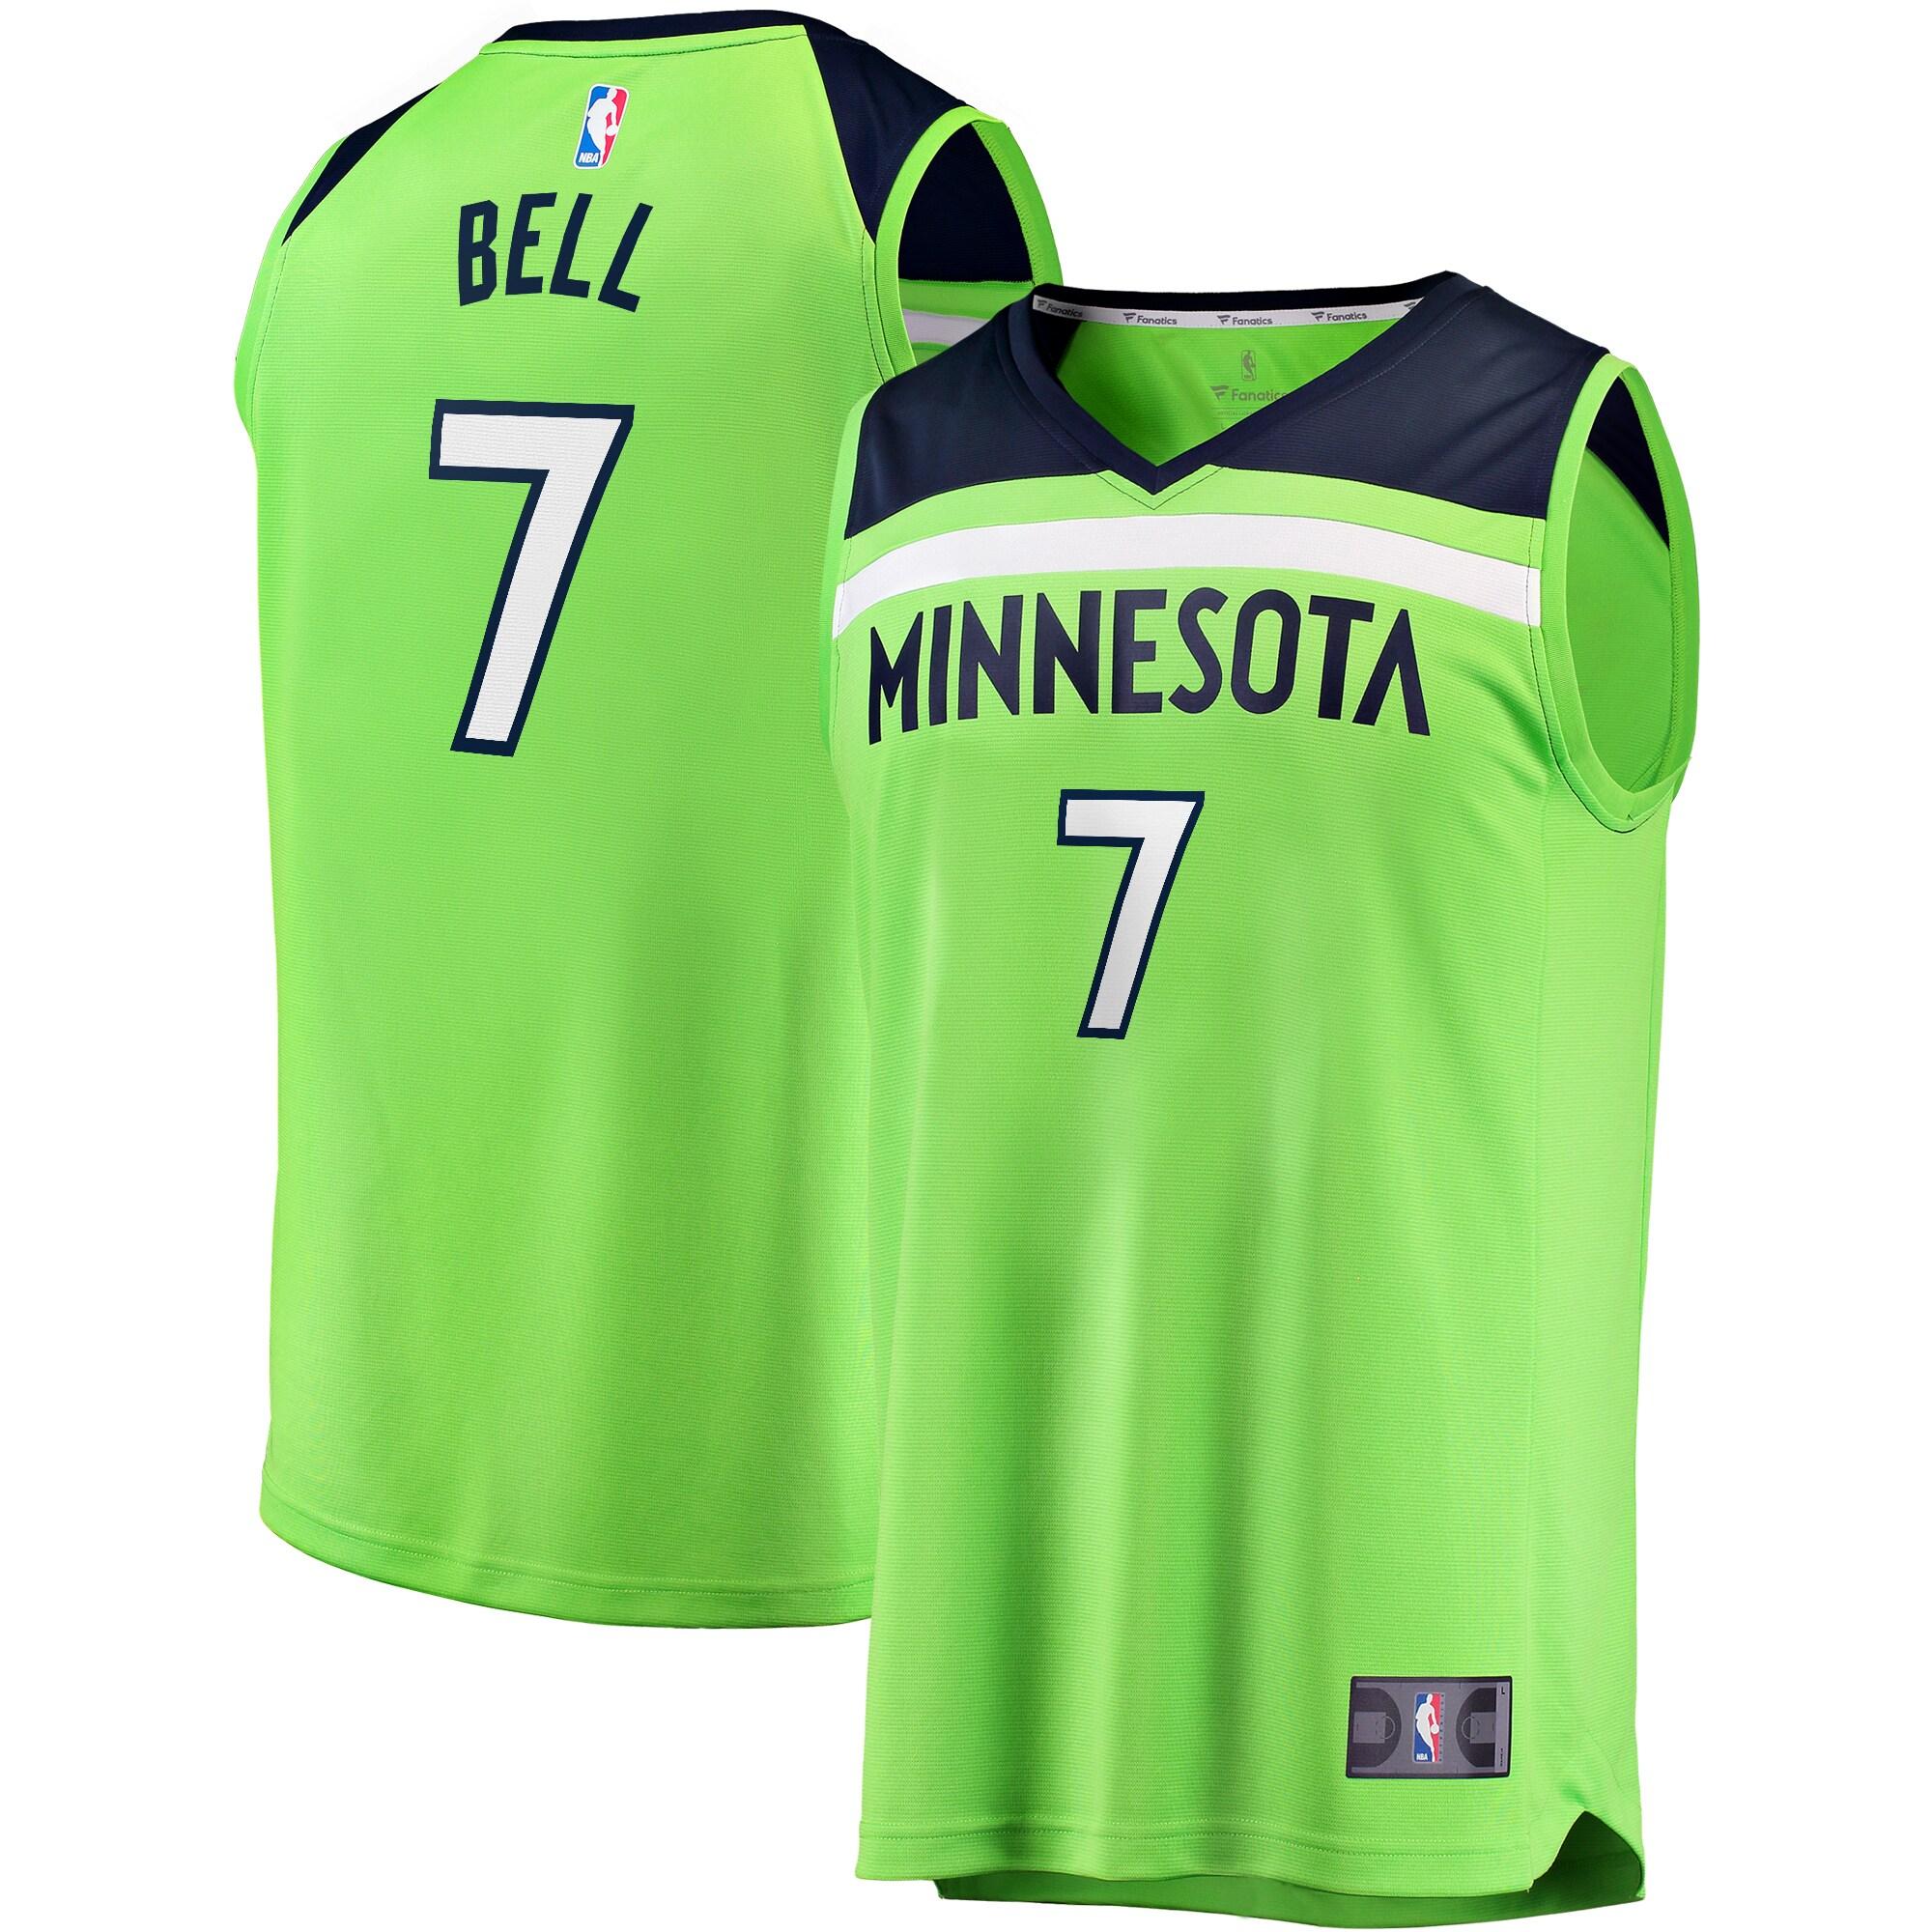 Jordan Bell Minnesota Timberwolves Fanatics Branded Fast Break Replica Player Jersey Green - Statement Edition